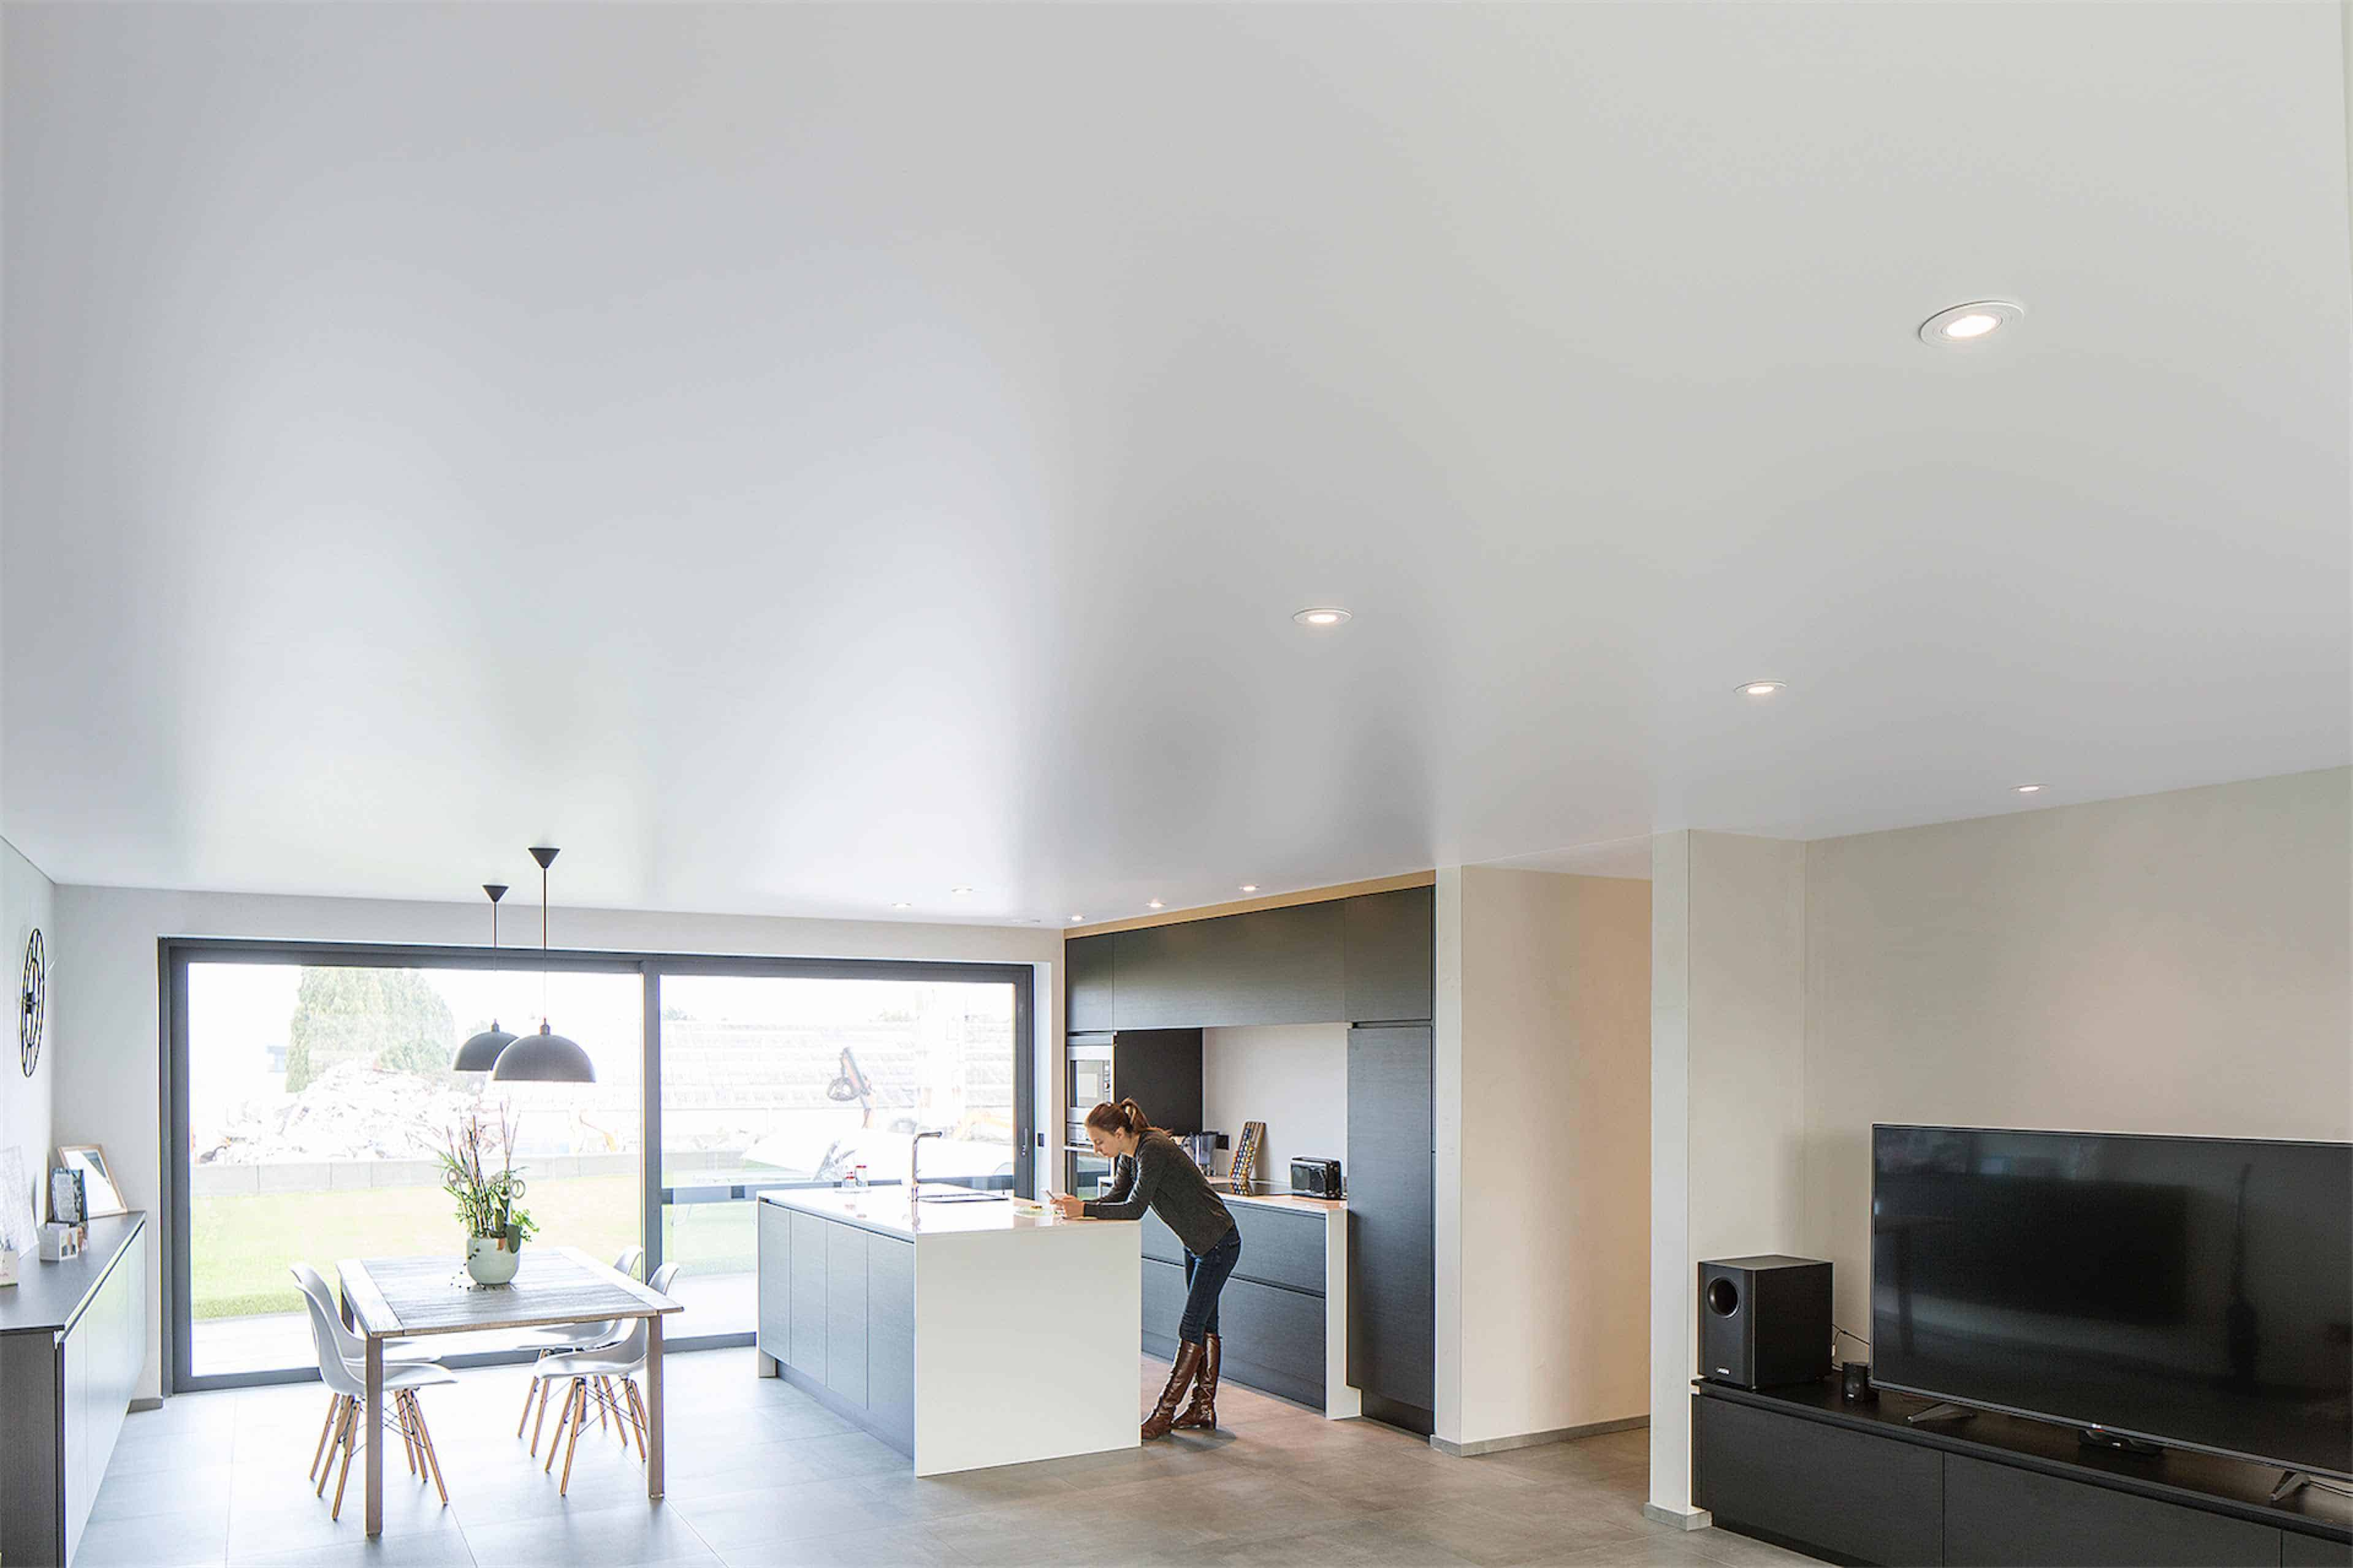 Welke Badkamer Verwarming : Plafond badkamer soorten plafondbekleding voordelen advies